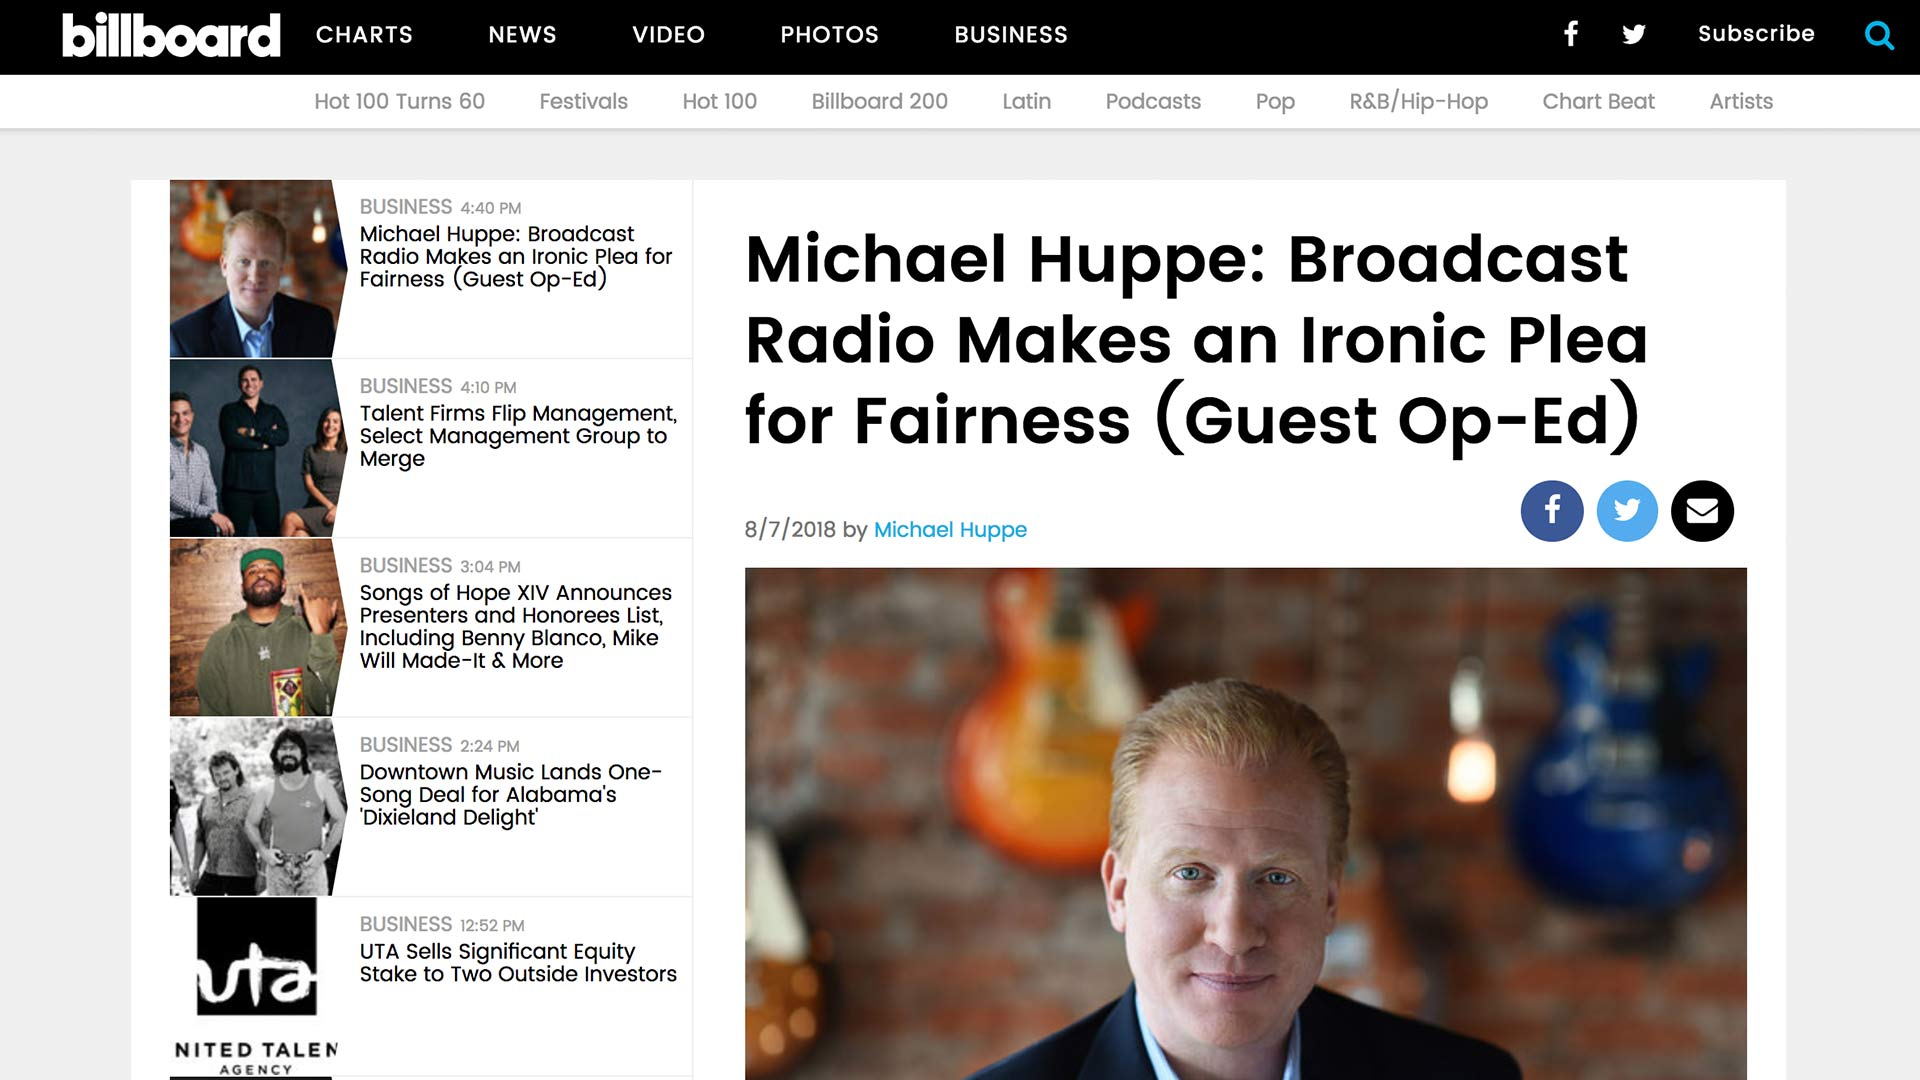 Fairness Rocks News Michael Huppe: Broadcast Radio Makes an Ironic Plea for Fairness (Guest Op-Ed)